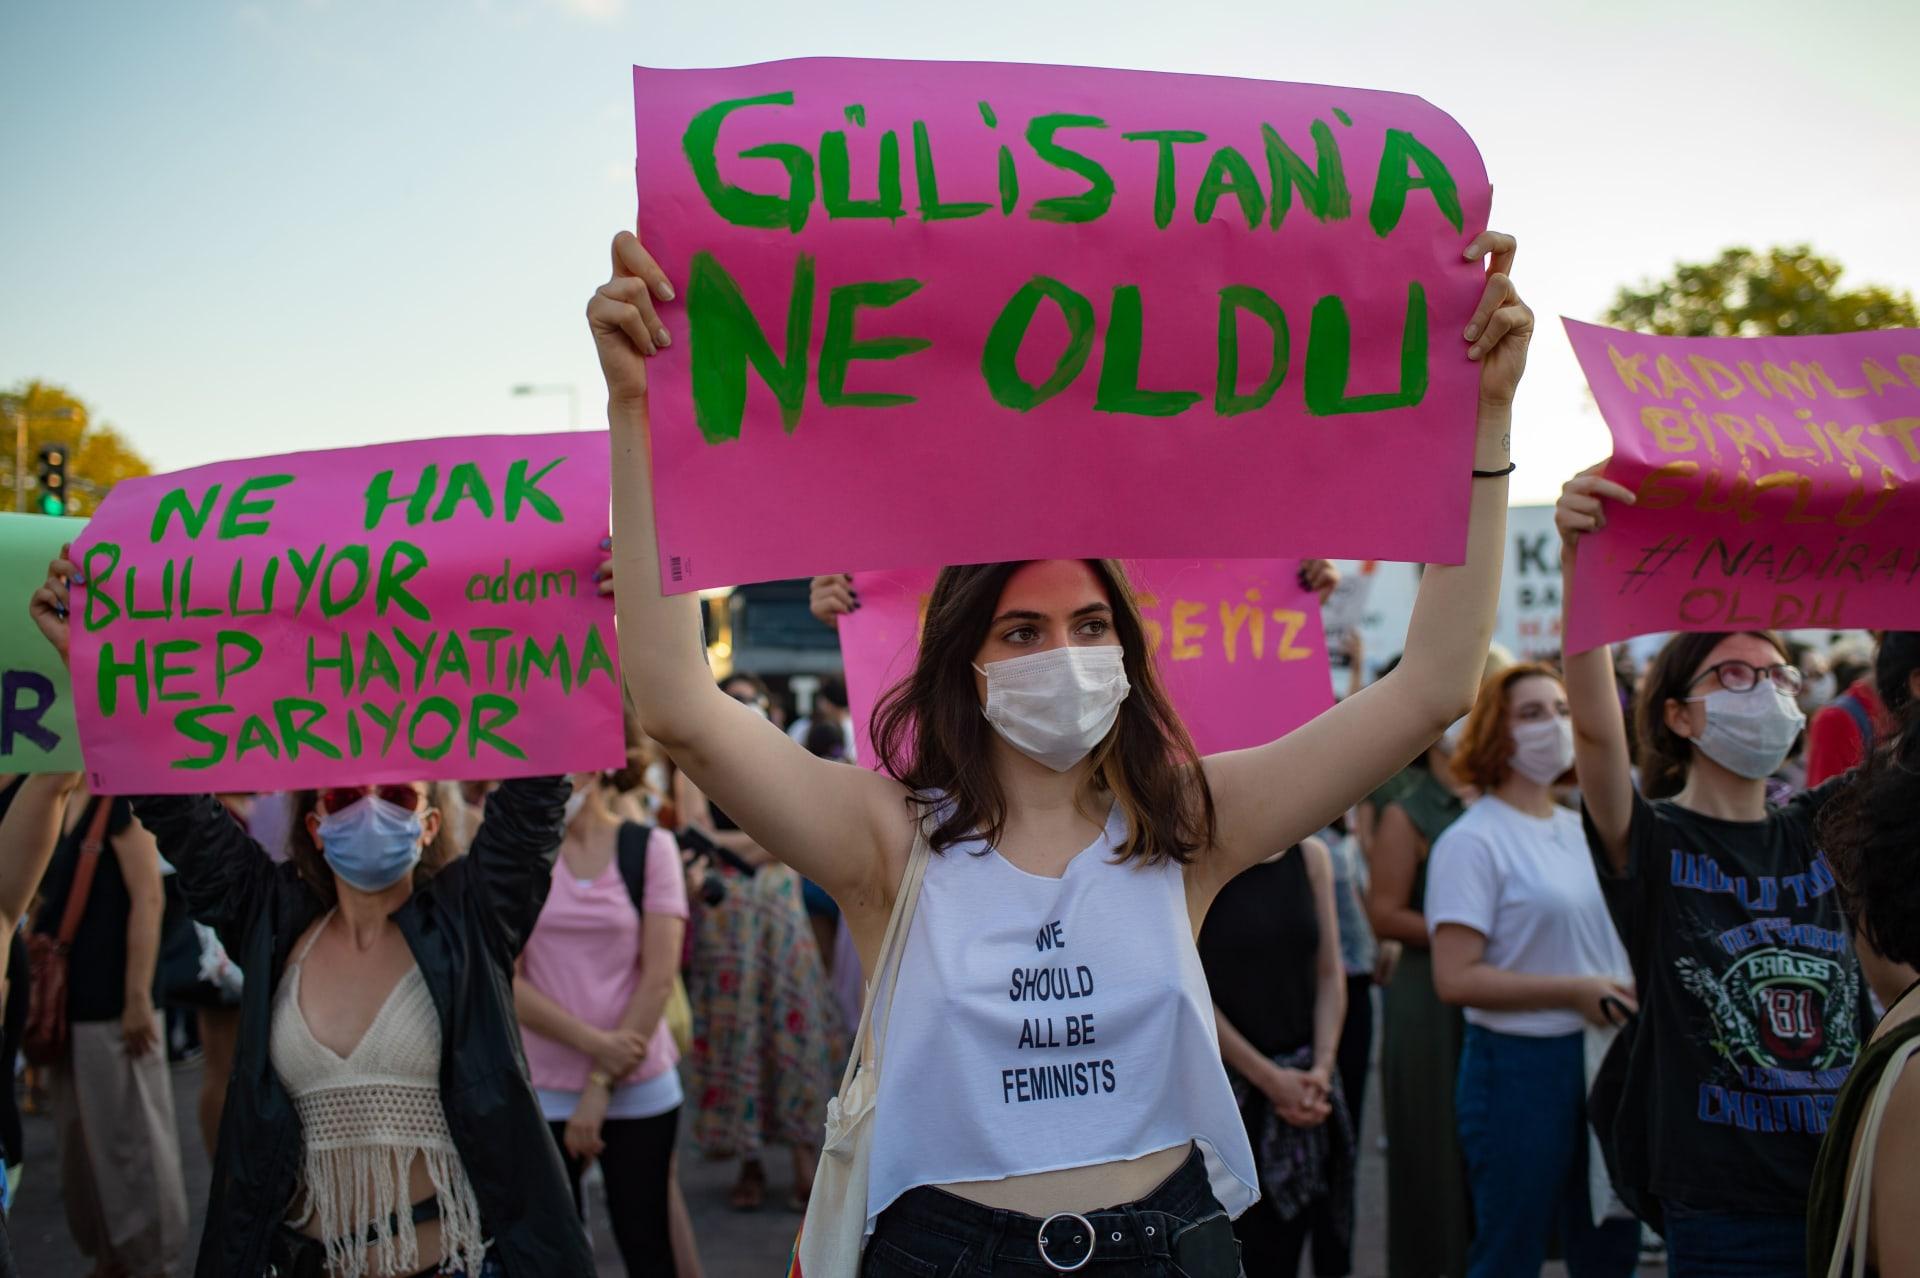 لماذا خرجت مظاهرات نسائية في تركيا ضد حزب أردوغان؟